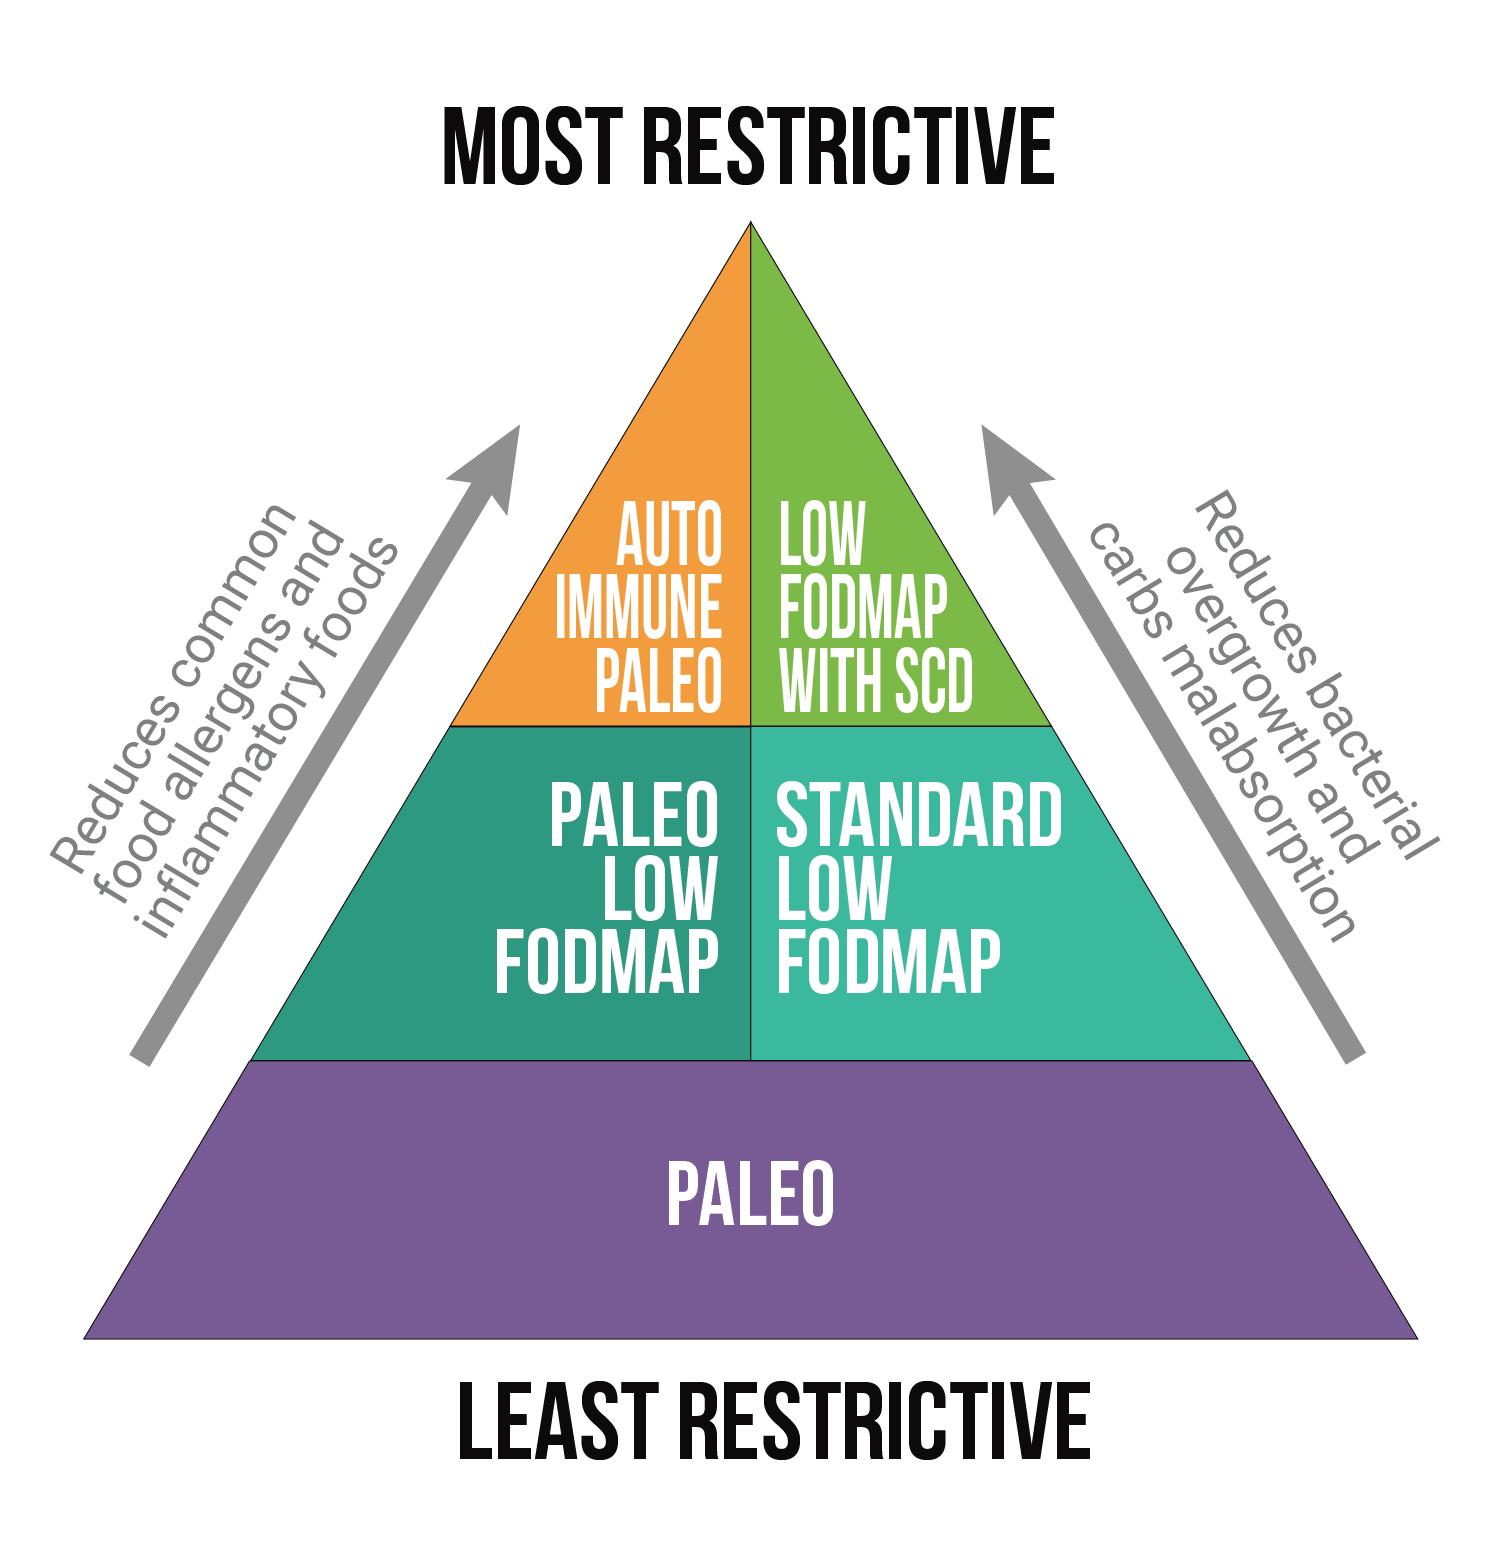 autoimmune protocol diet or fodmap